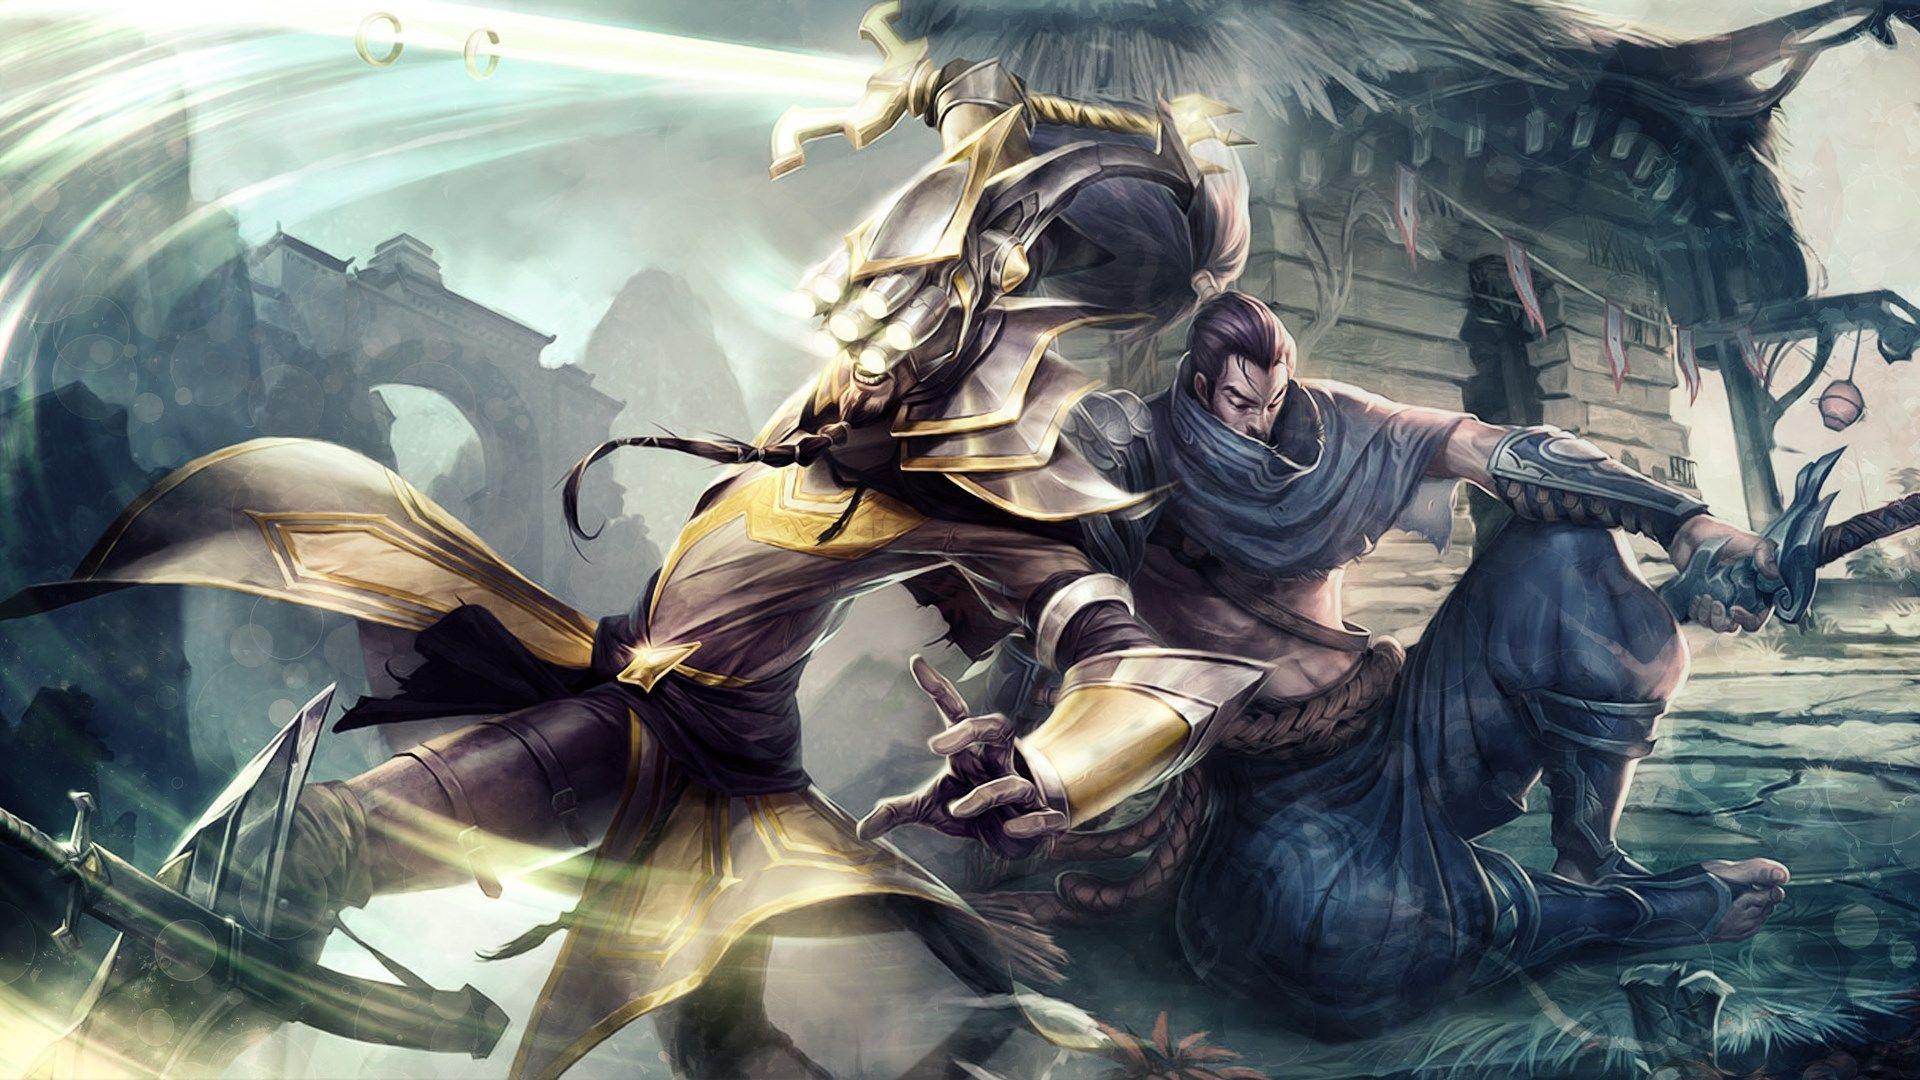 Master Yi Yasuo Lol Wallpaper Hd Free Download